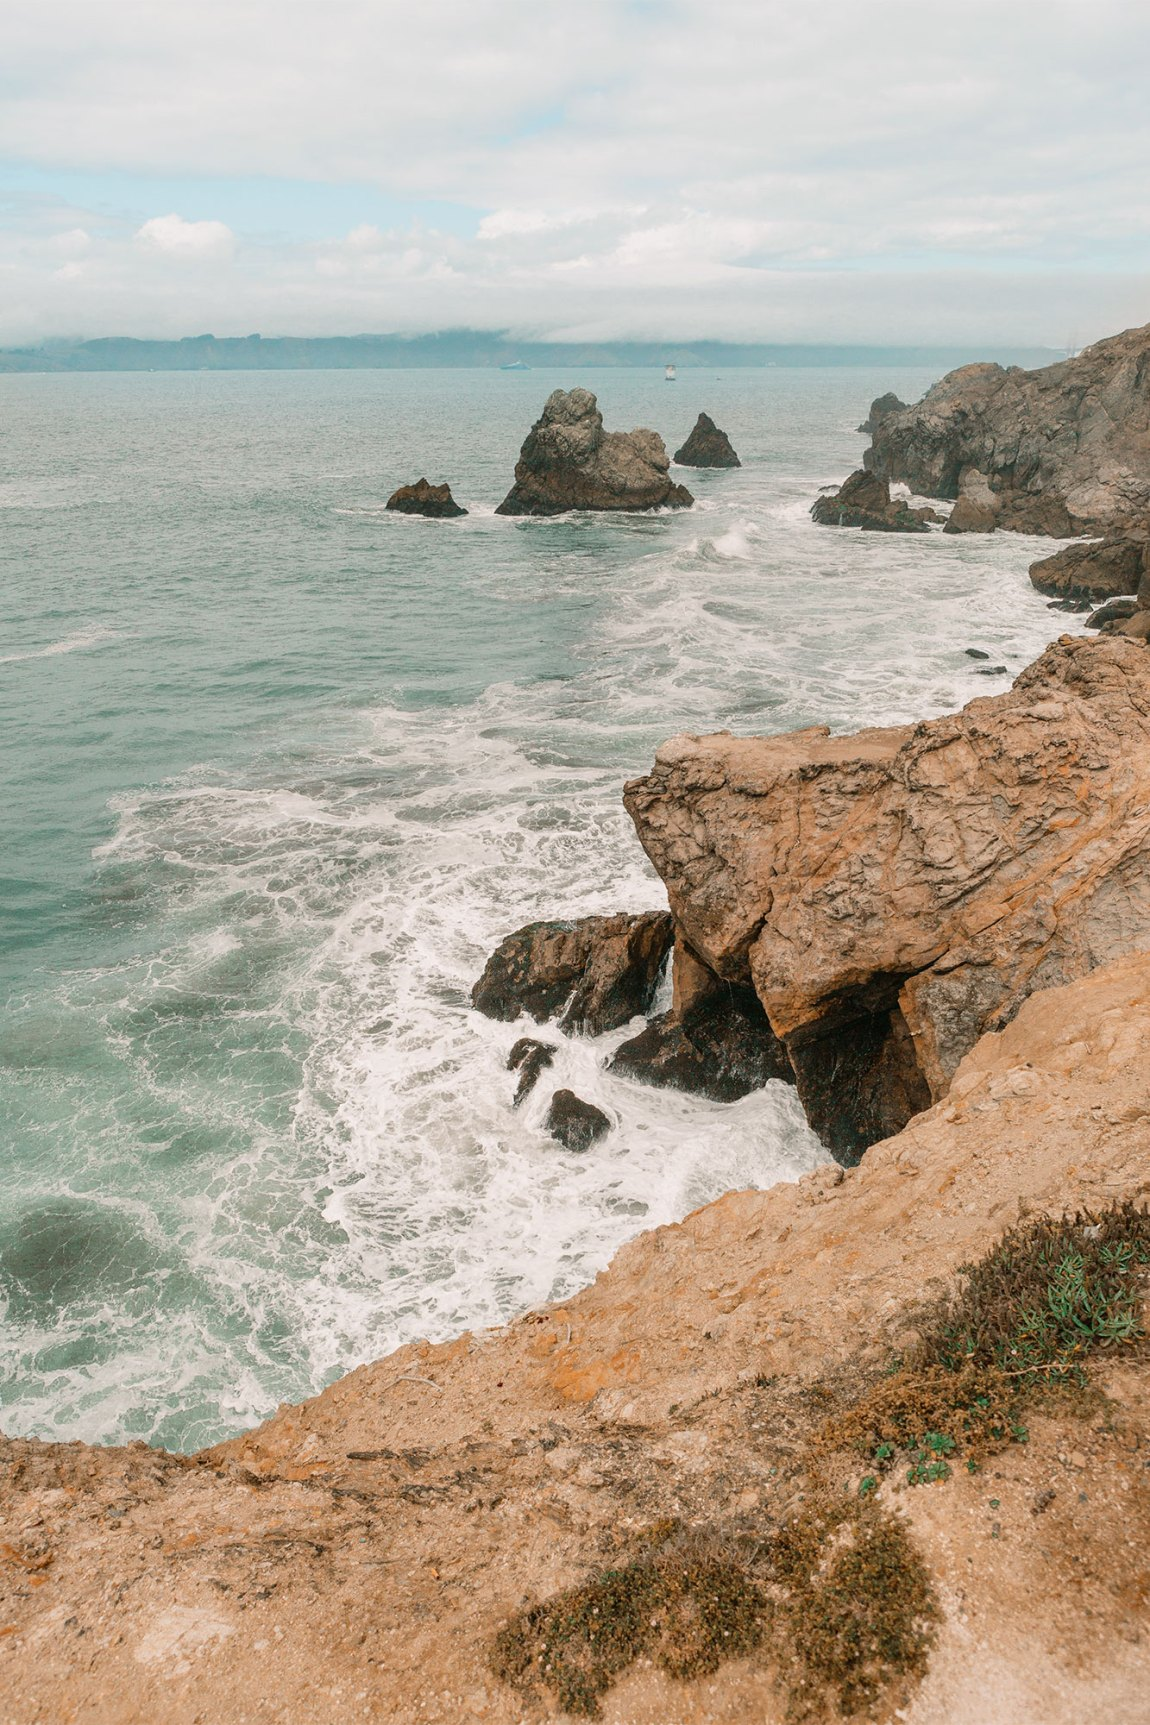 Historic Sutro Bath Ruins on the shore of San Francisco